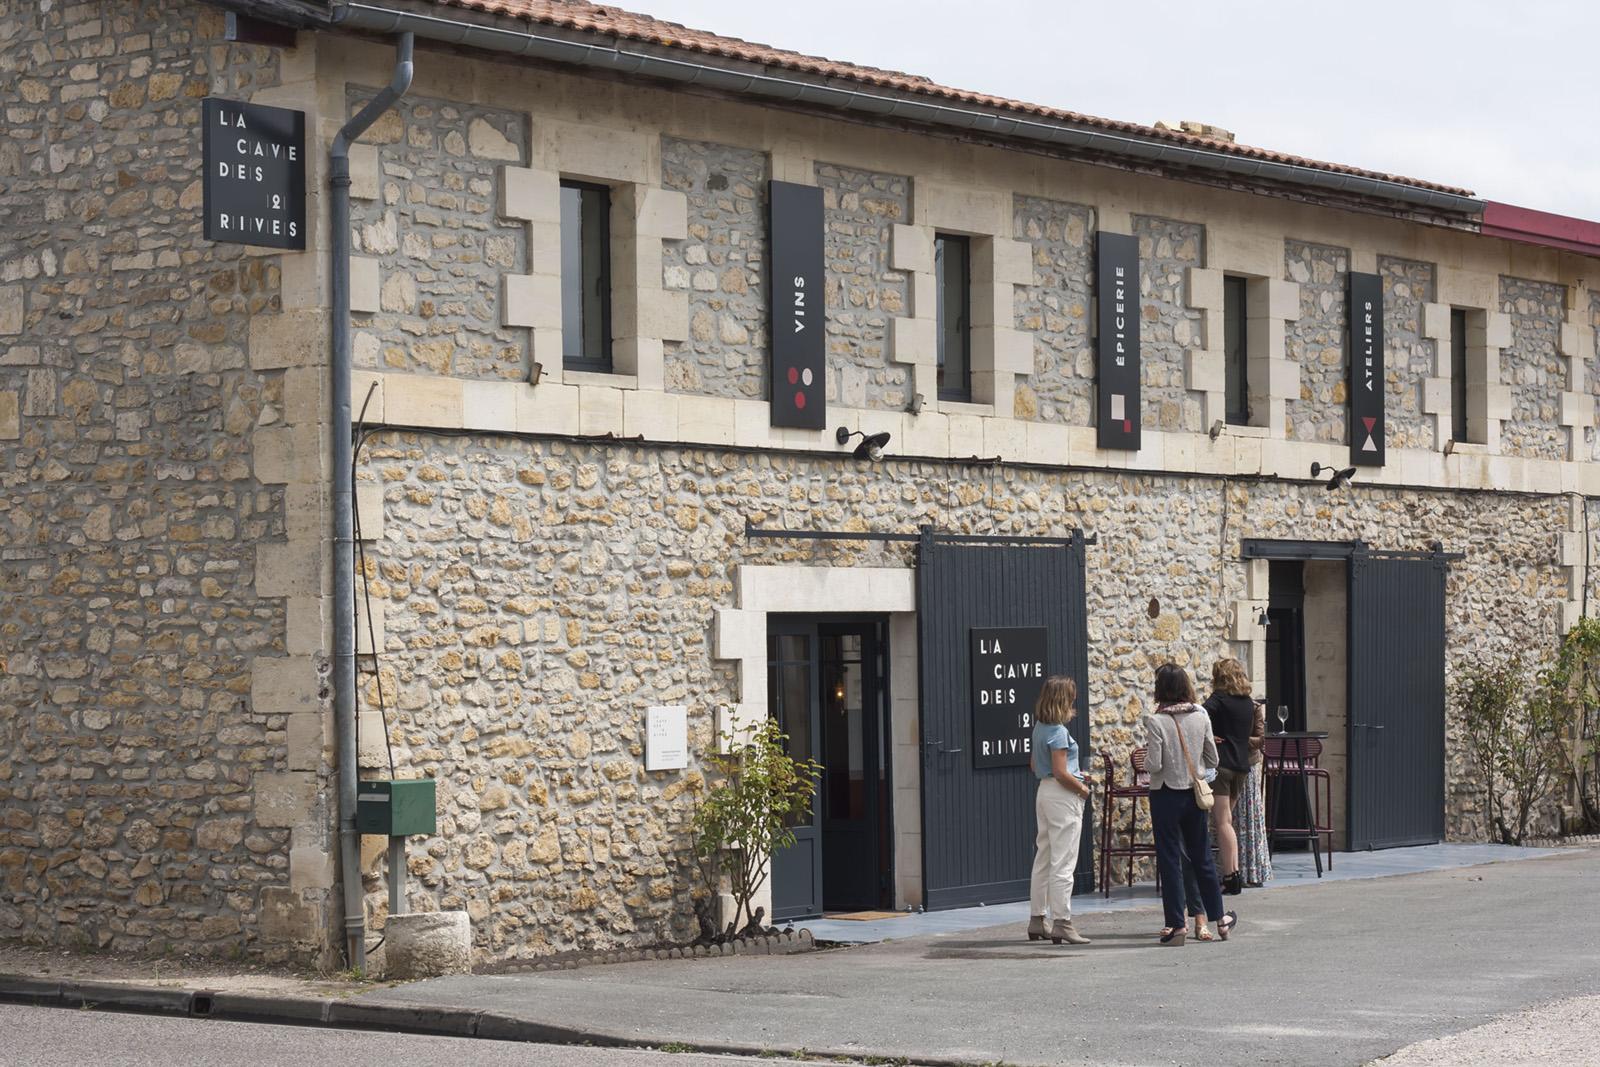 Vignobles Clément Fayat / Cave des 2 rives, Médoc / MJ Studio